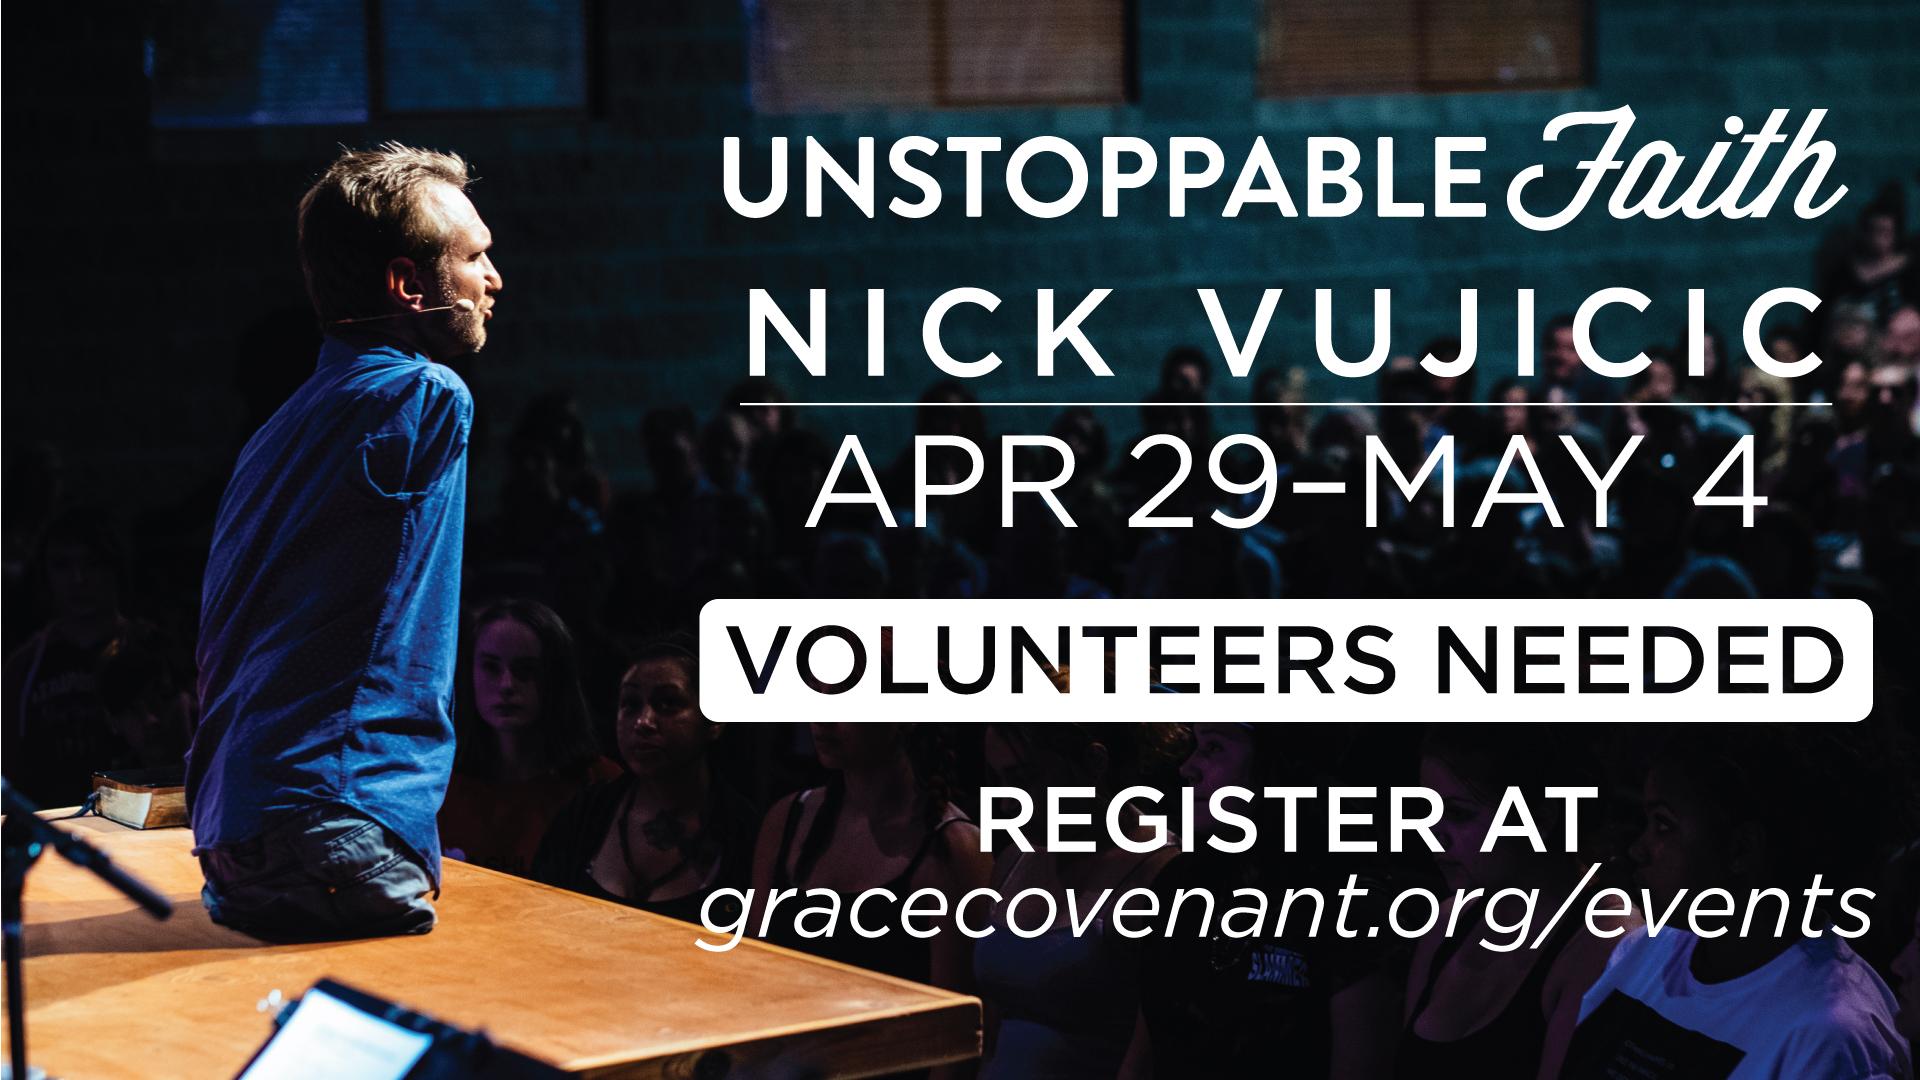 Unstoppable-Faith_Volunteers_title.jpg